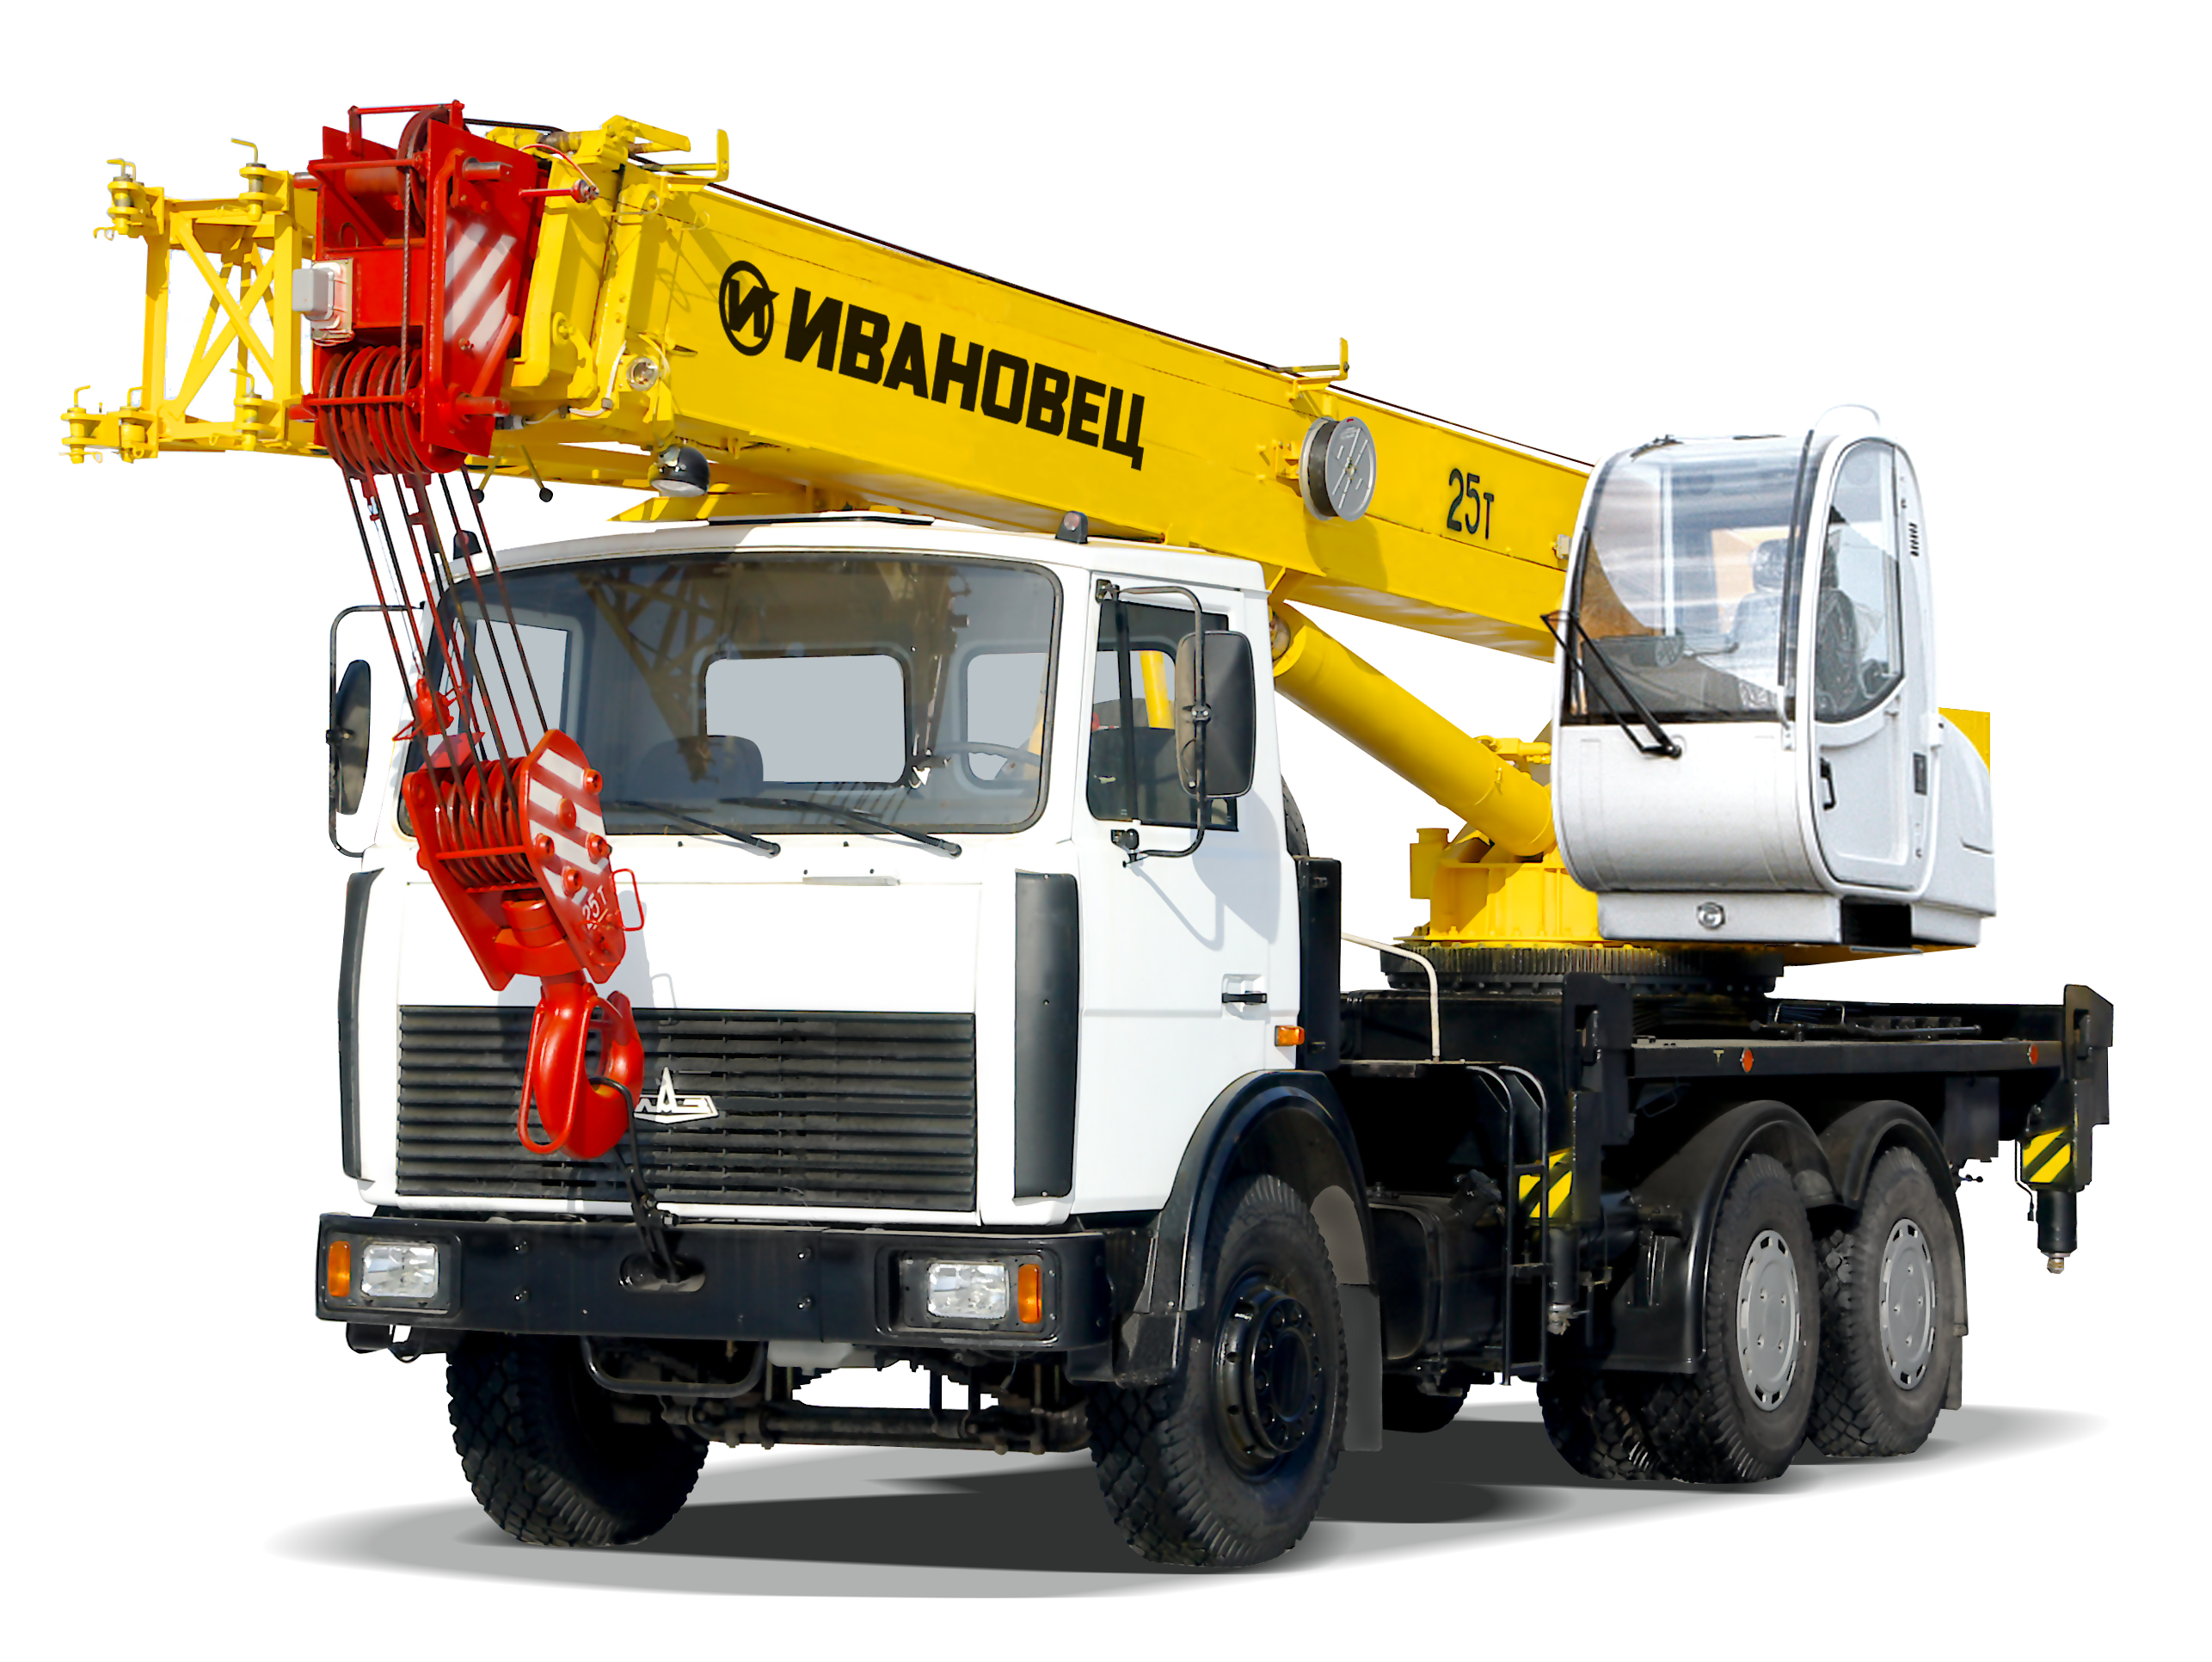 Crane clipart under construction. Icon png web icons